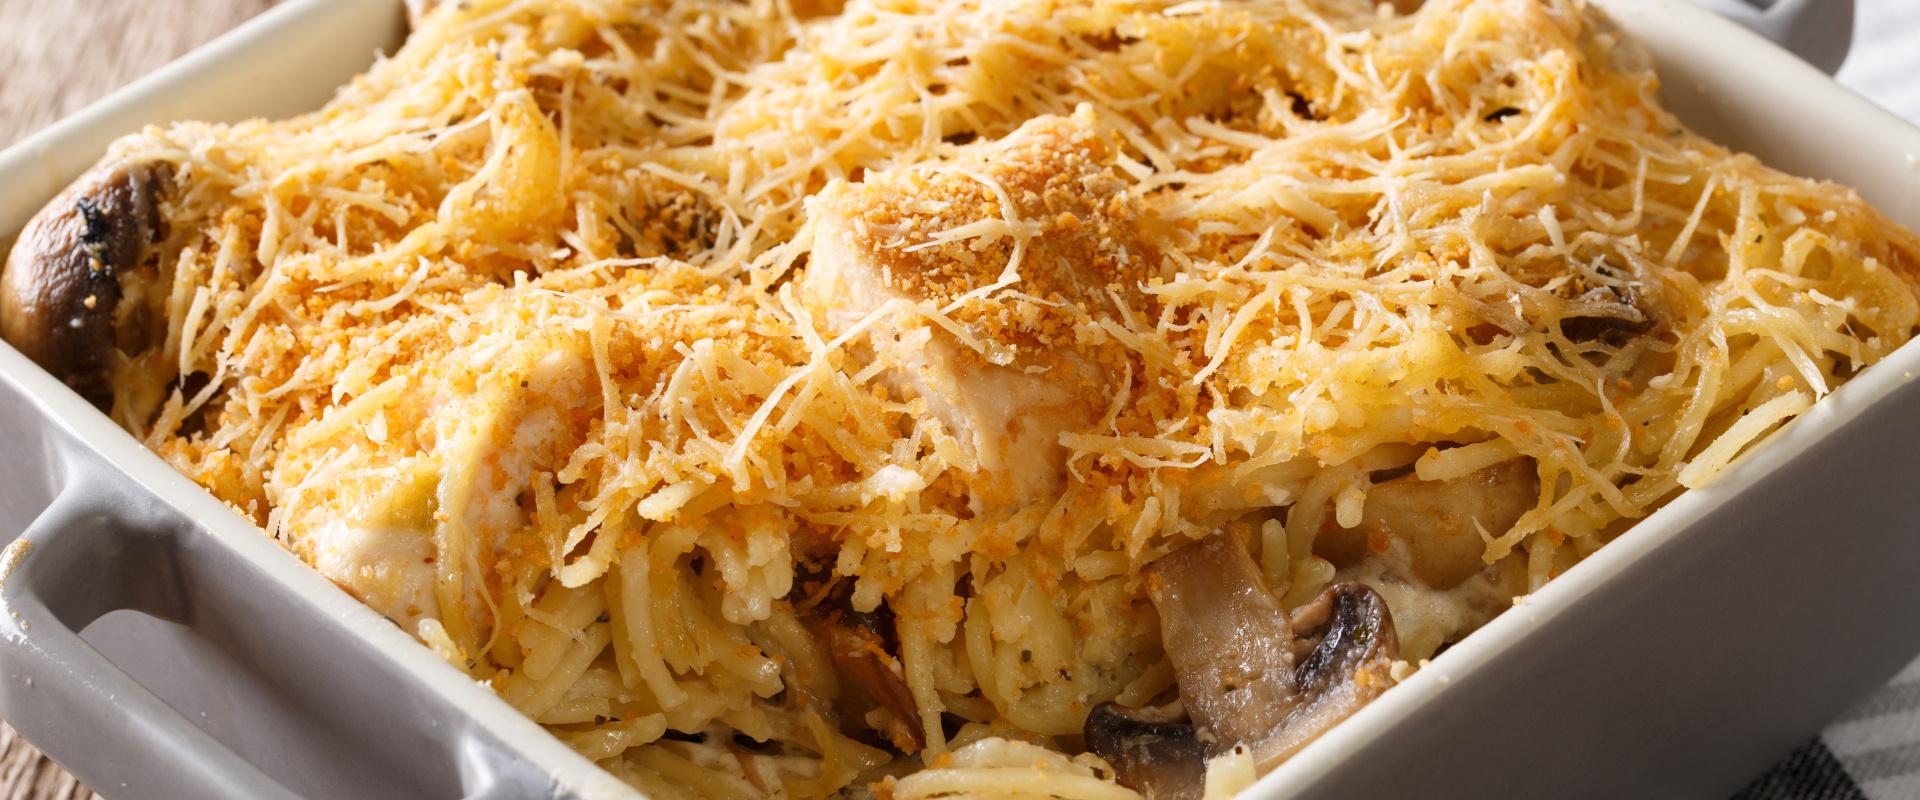 amerikai csirkés spagetti cover